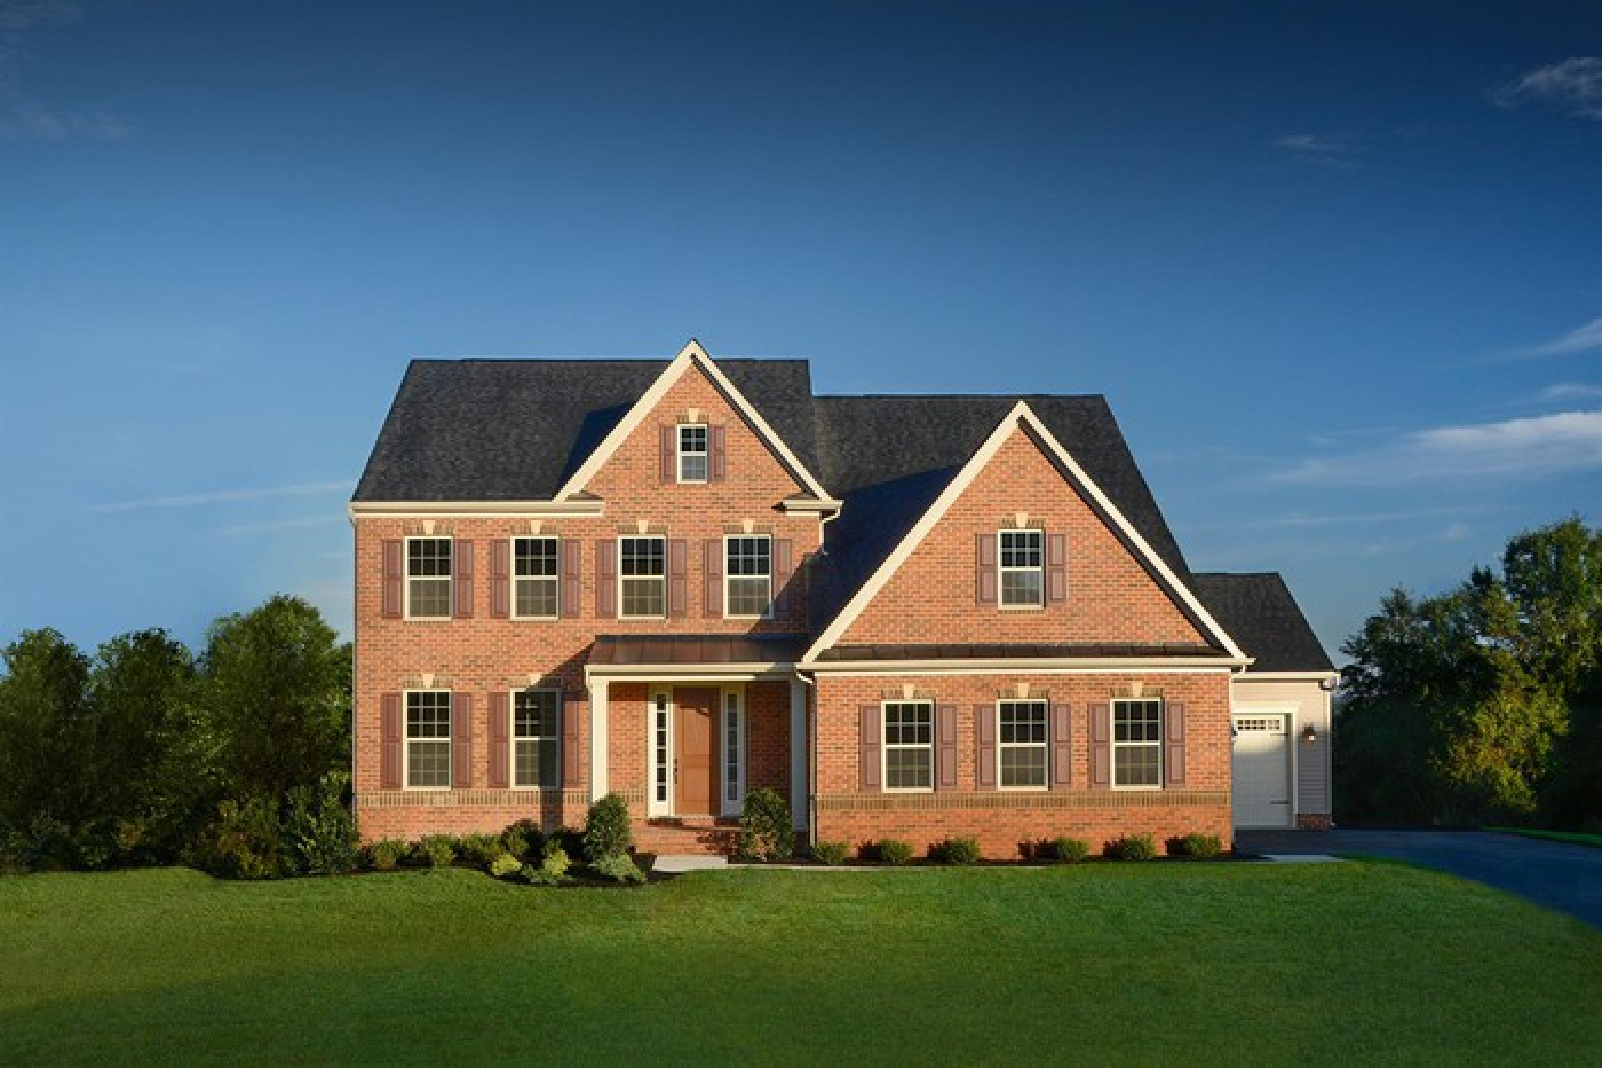 New home model